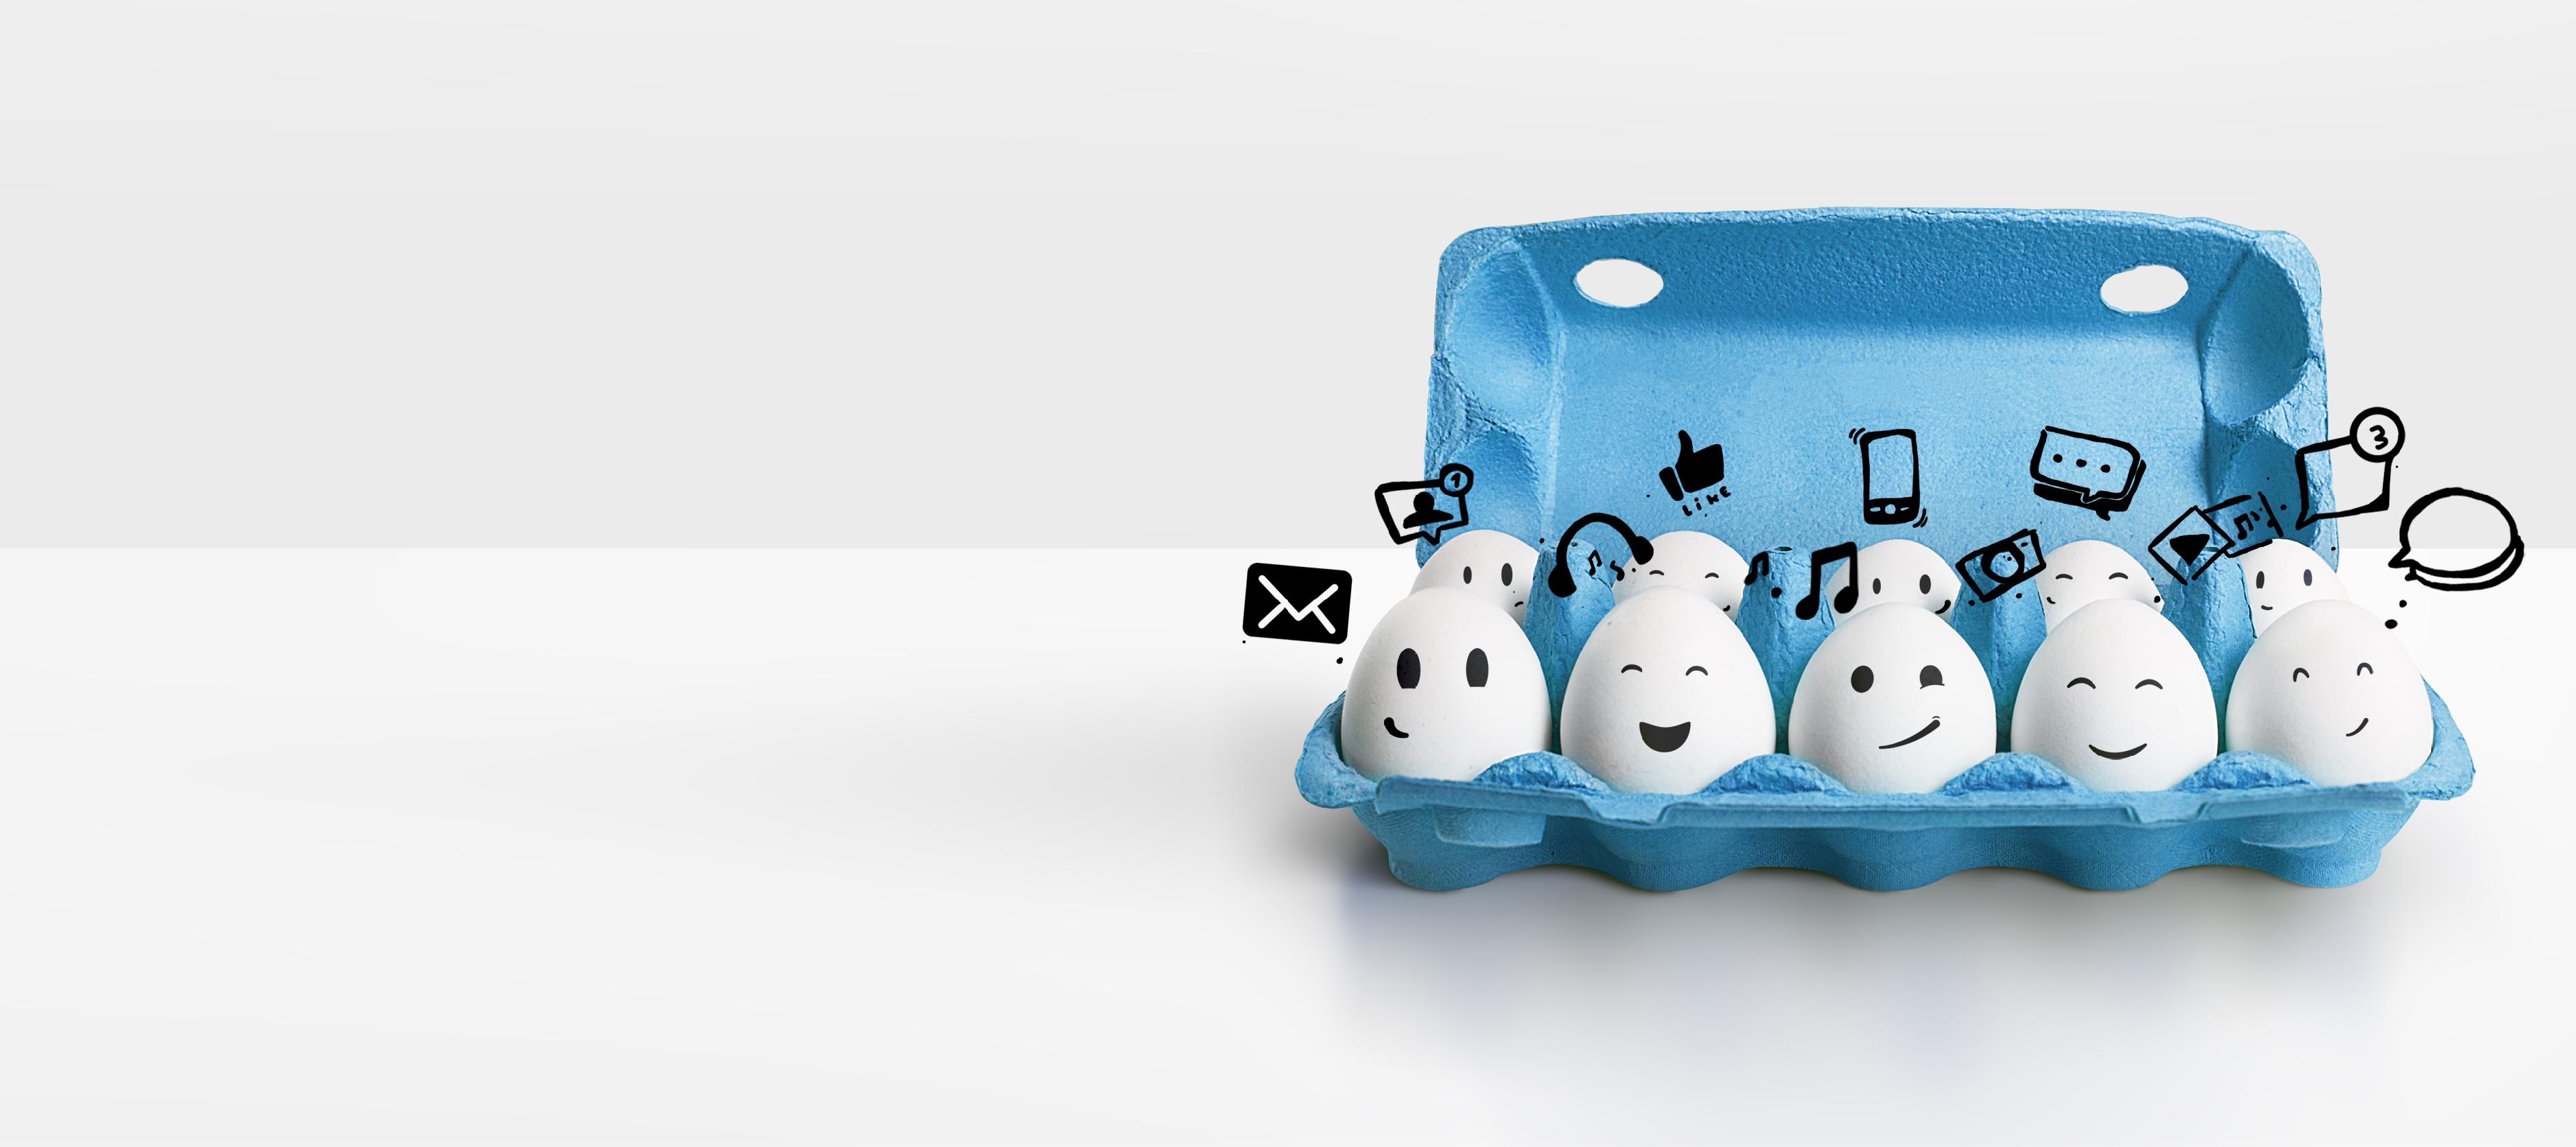 eggs in cases - media link digital marketing agency